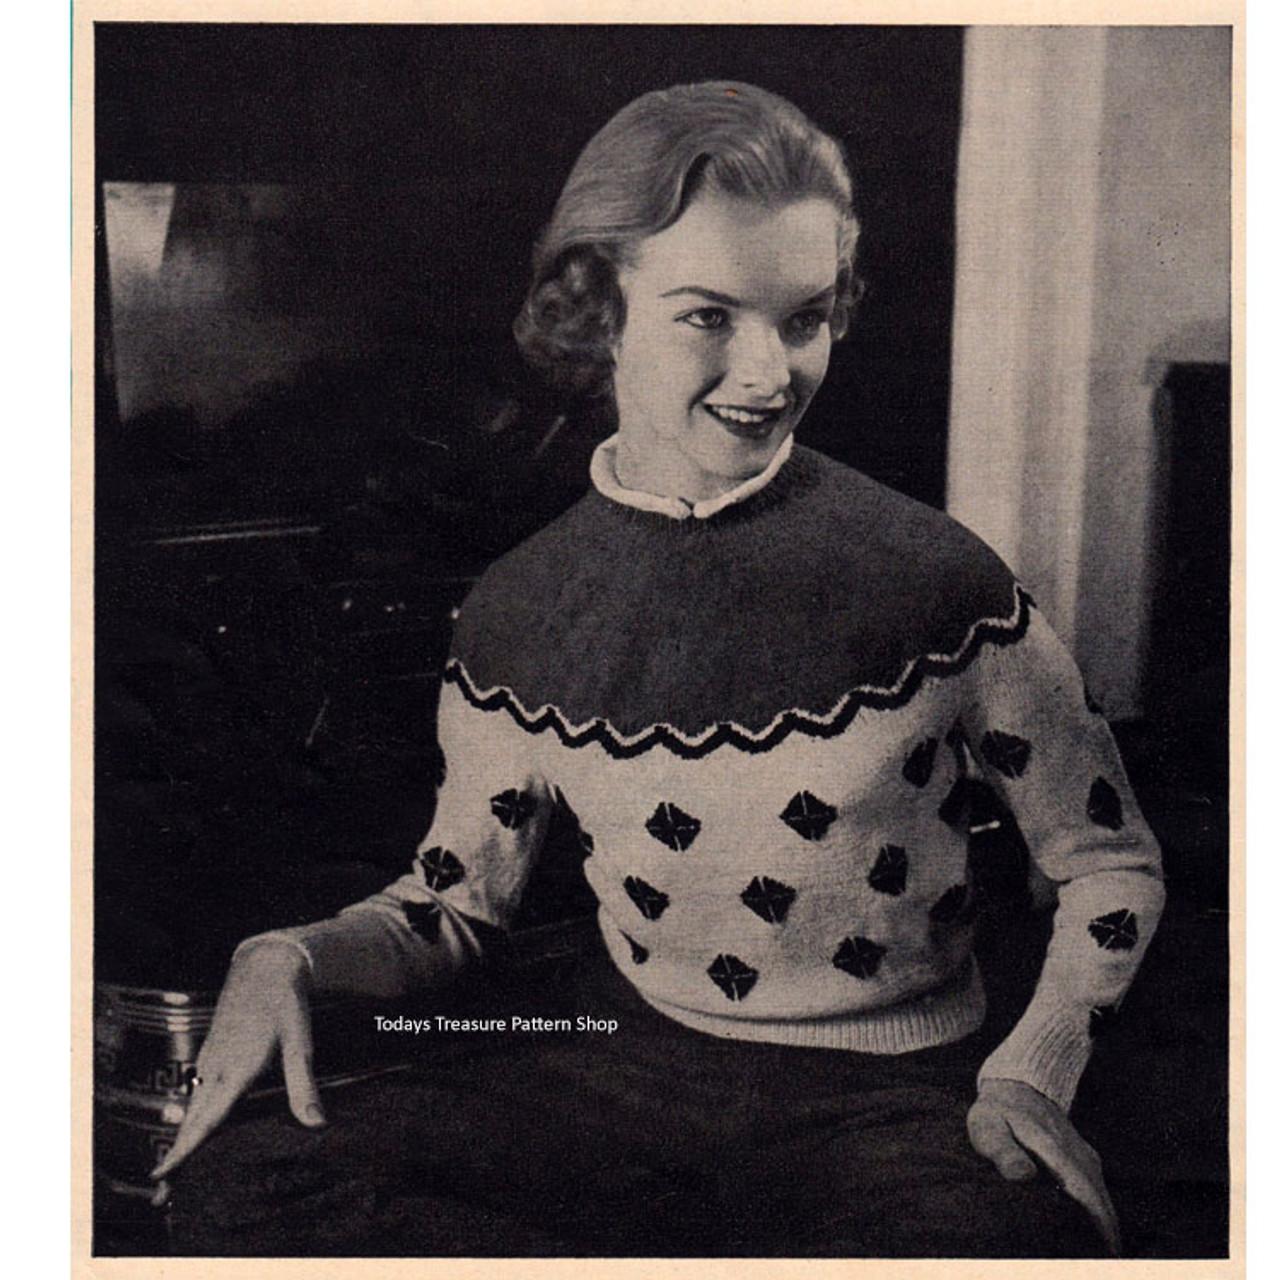 Knitting Pattern Sports Sweater with Contrast Yoke